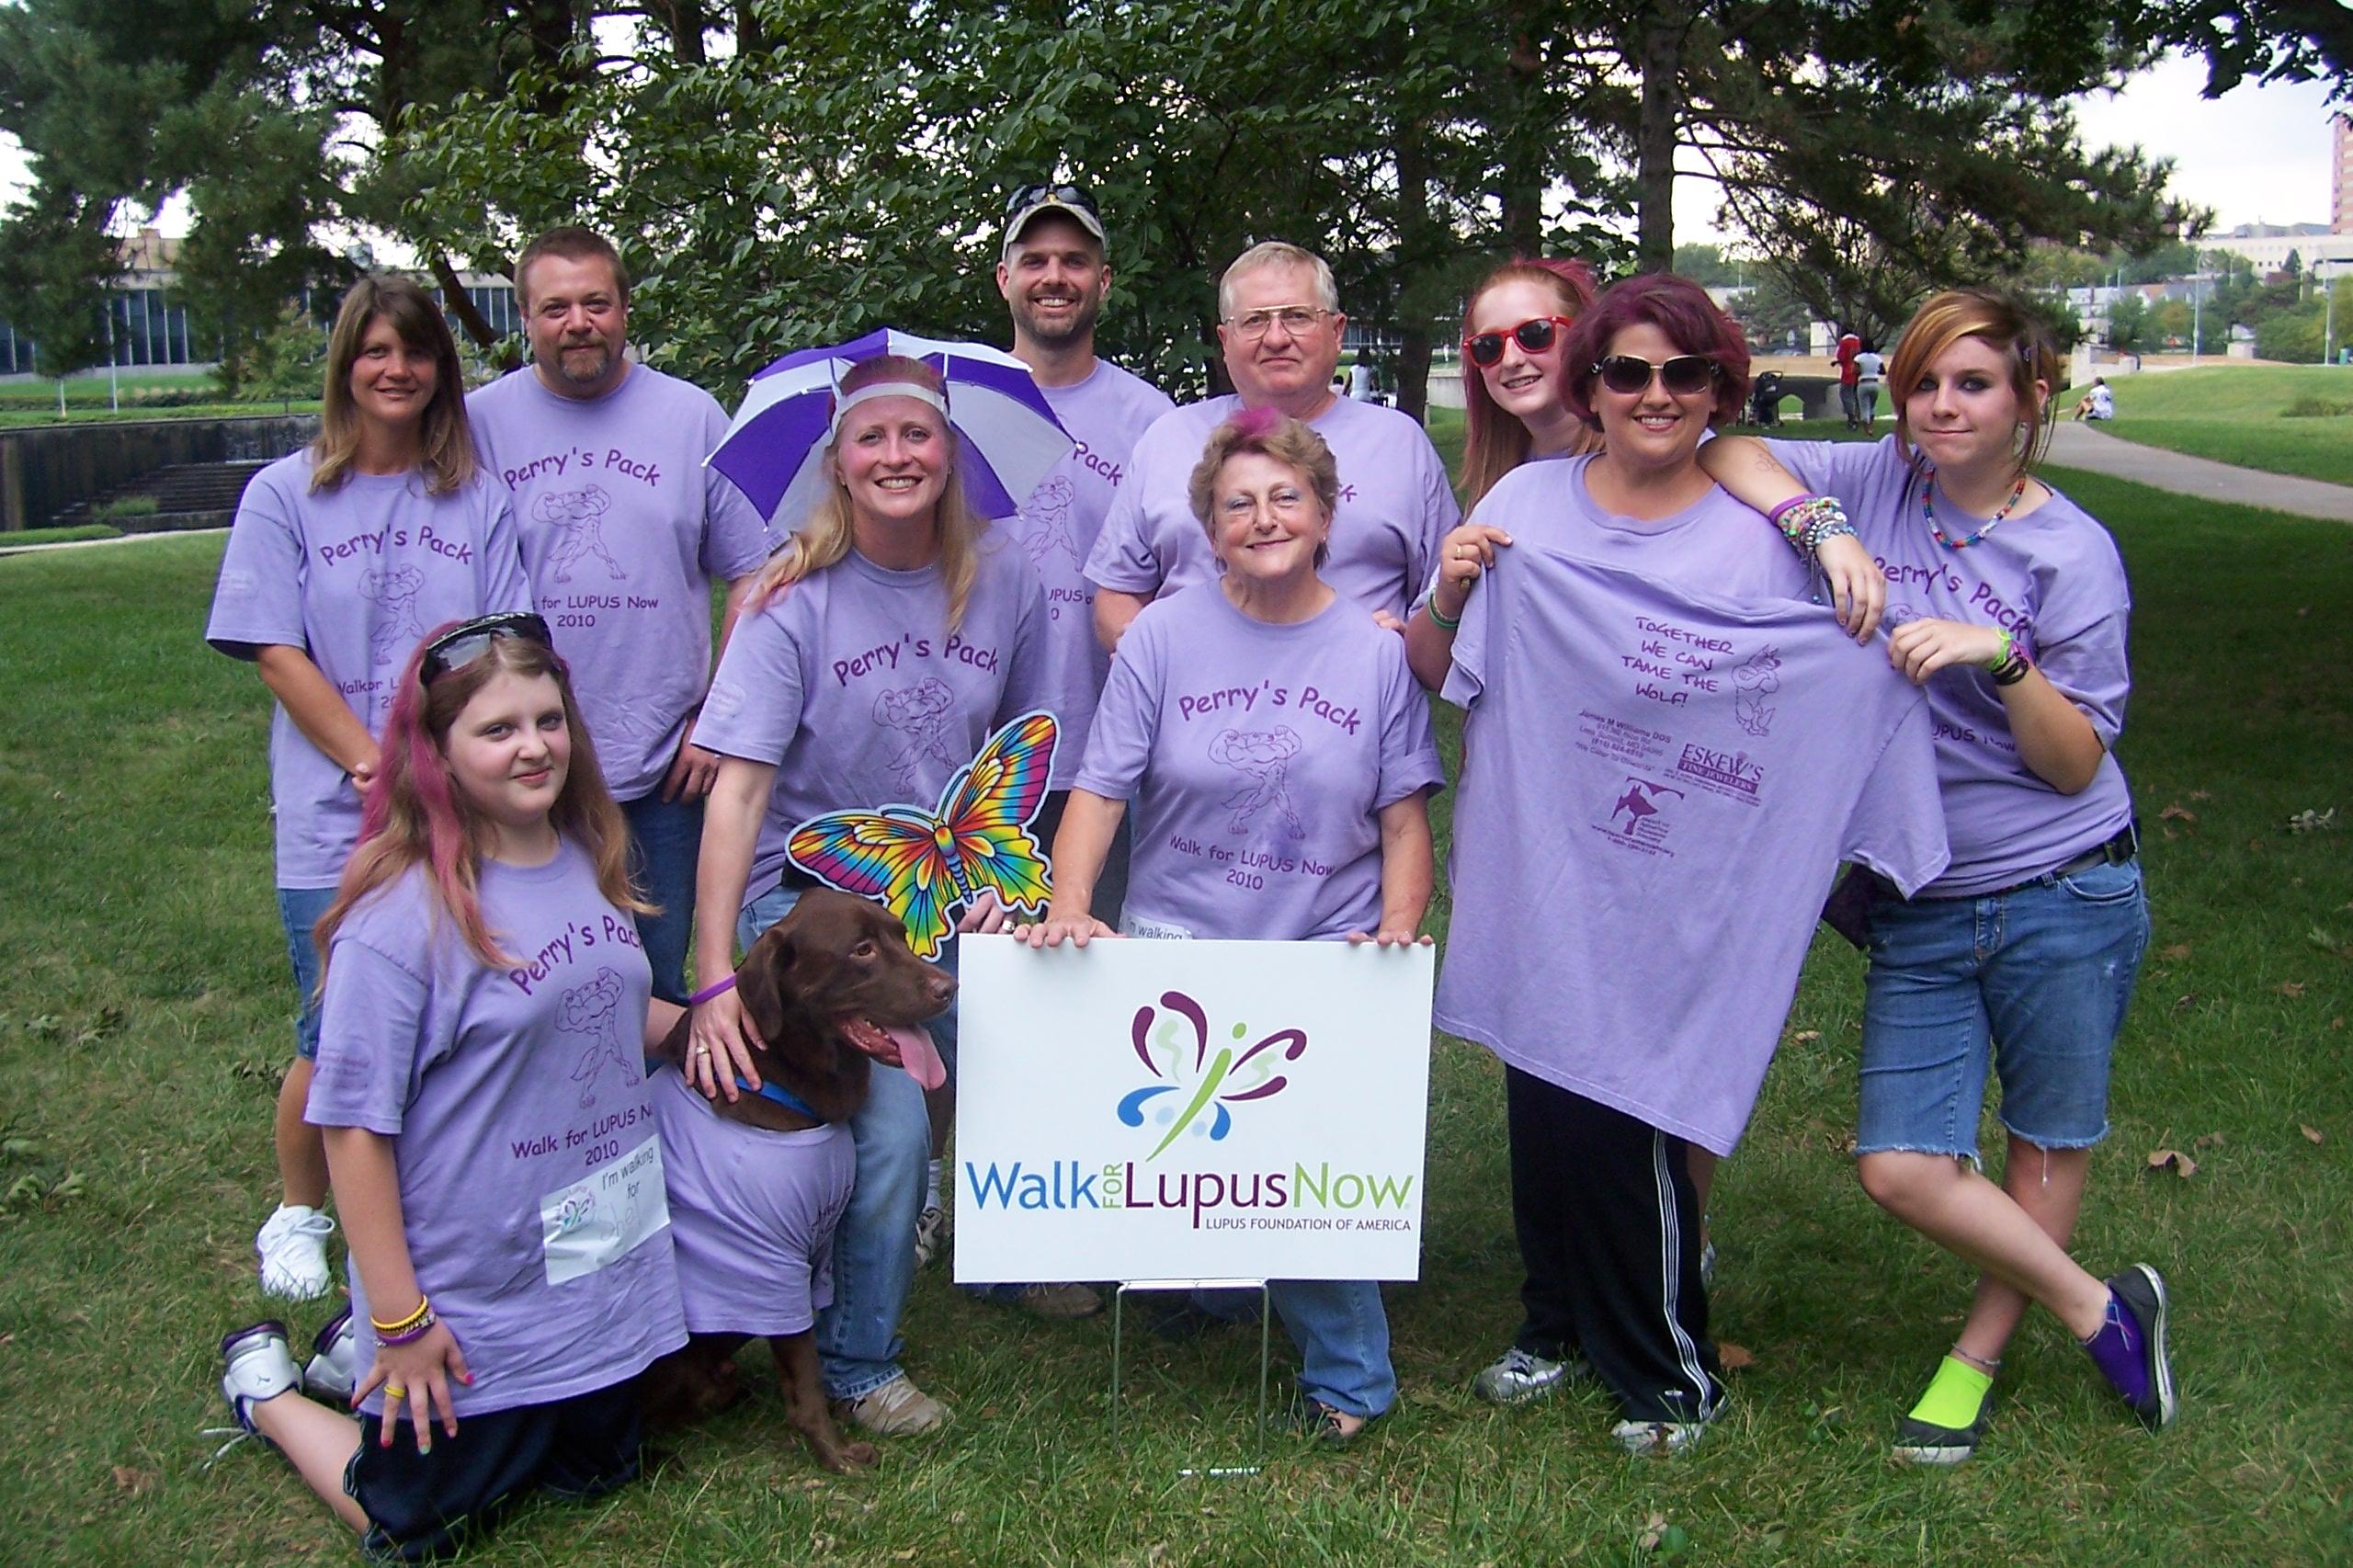 Shirt design killeen tx - Walk For Lupus Now 2010 T Shirt Photo